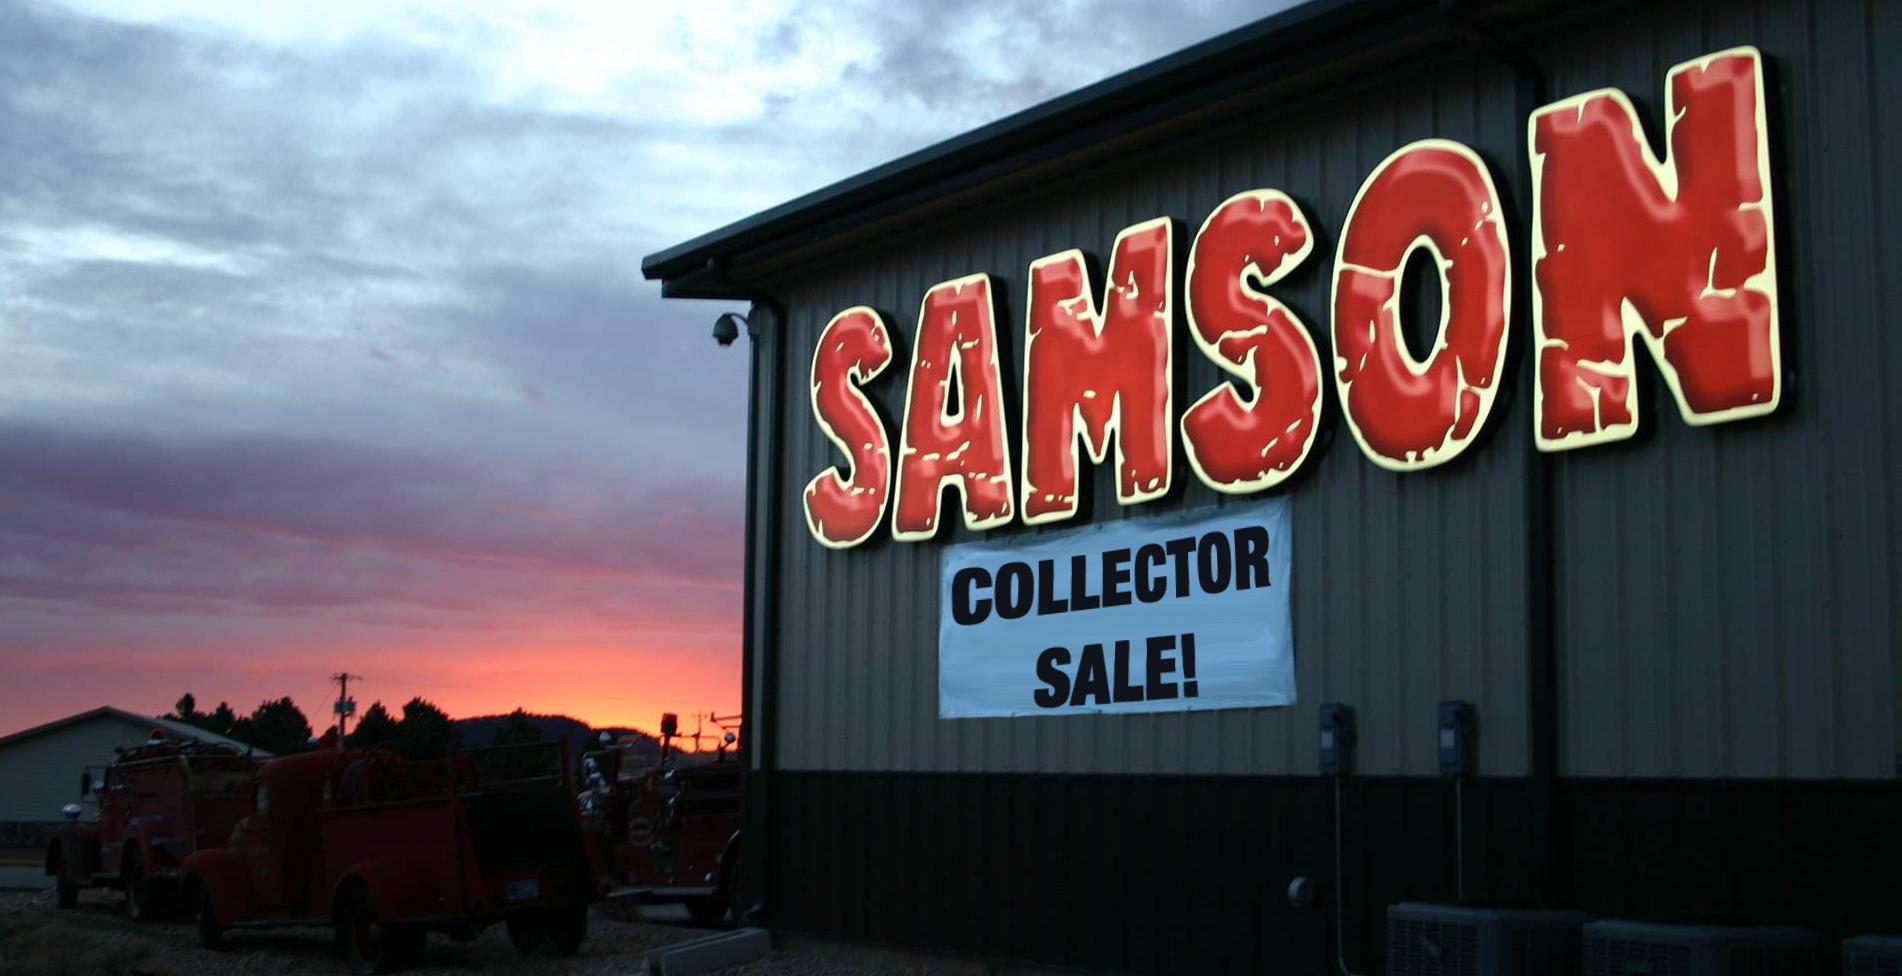 Huge Collector Sale at Samson Exhaust